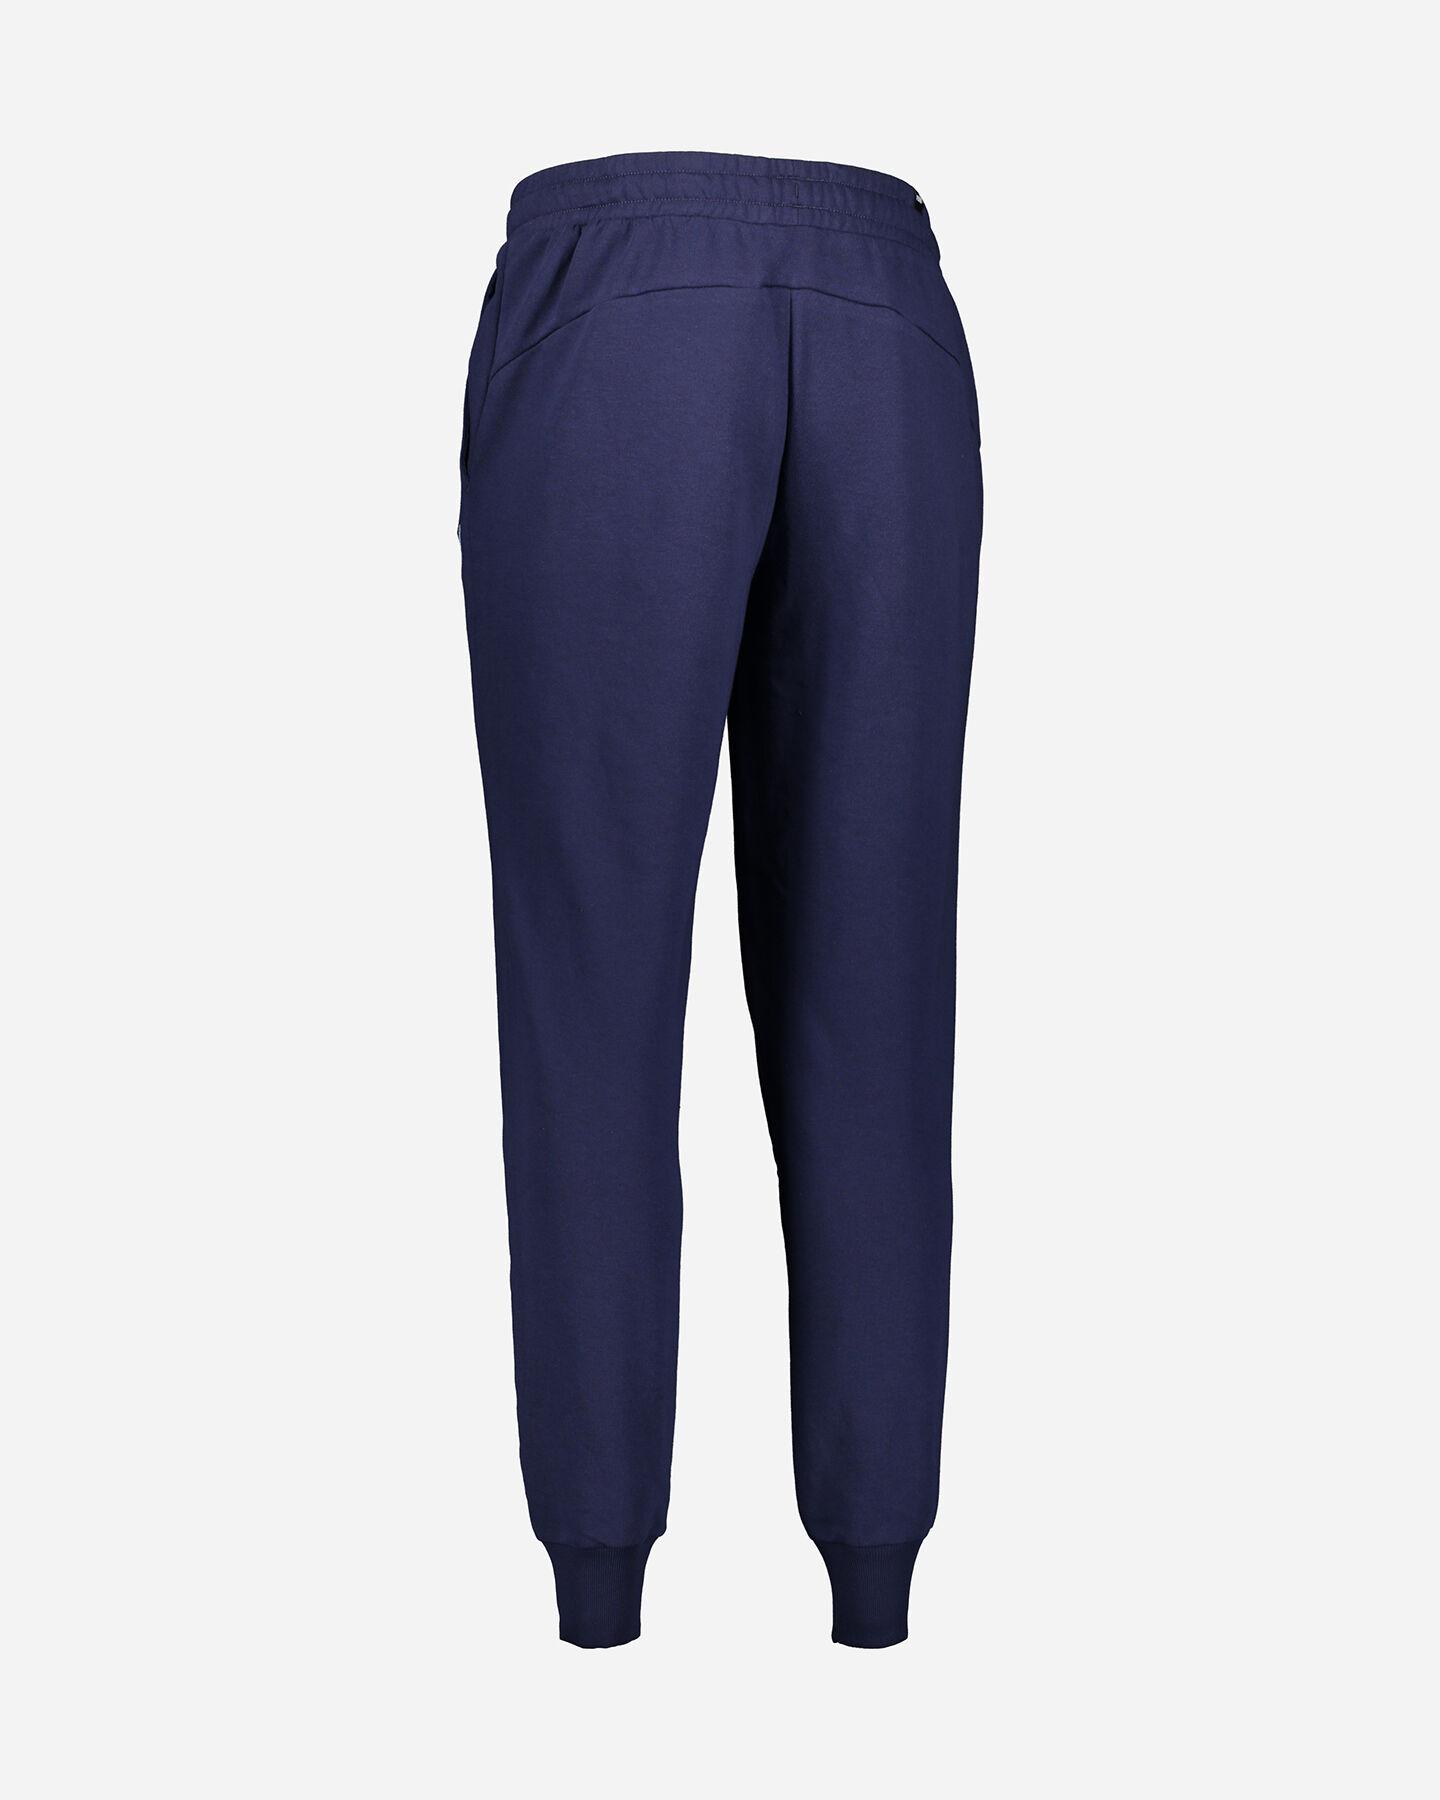 Pantalone PUMA CORE BLANK BASE CLOSED M S5339790 scatto 2